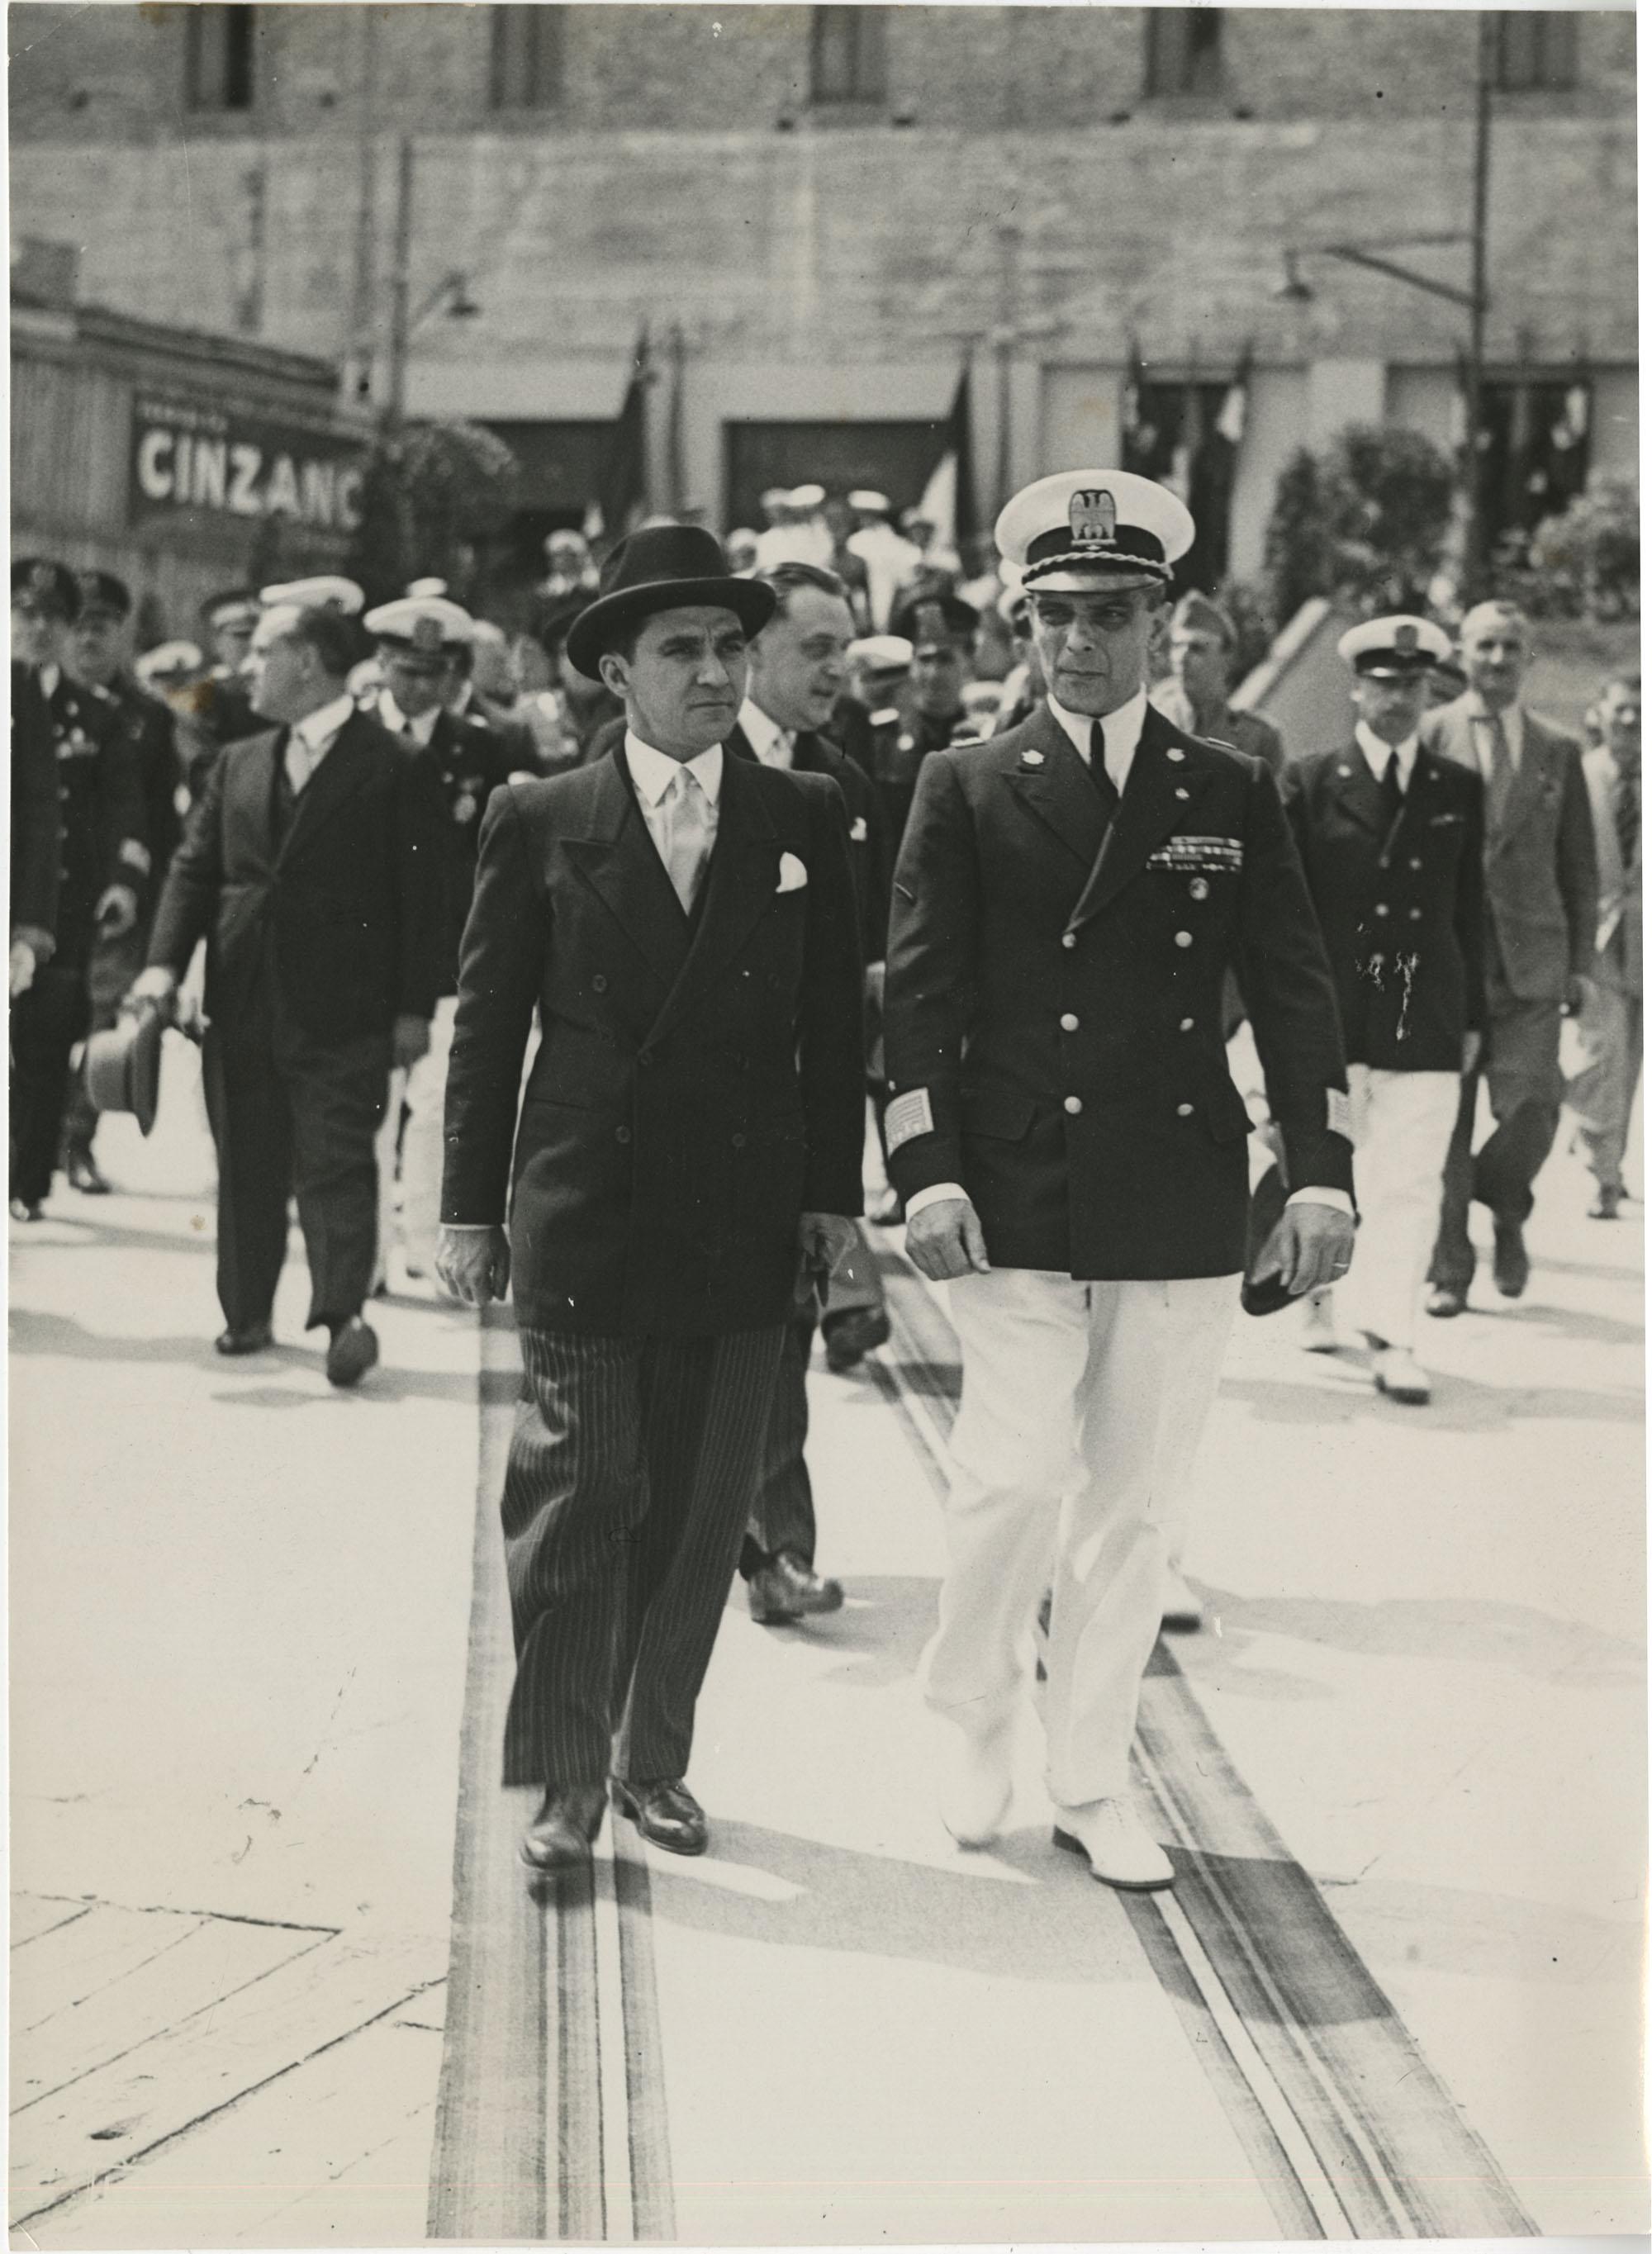 Mihai Antonescu's visit to Benito Mussolini, Photograph 56